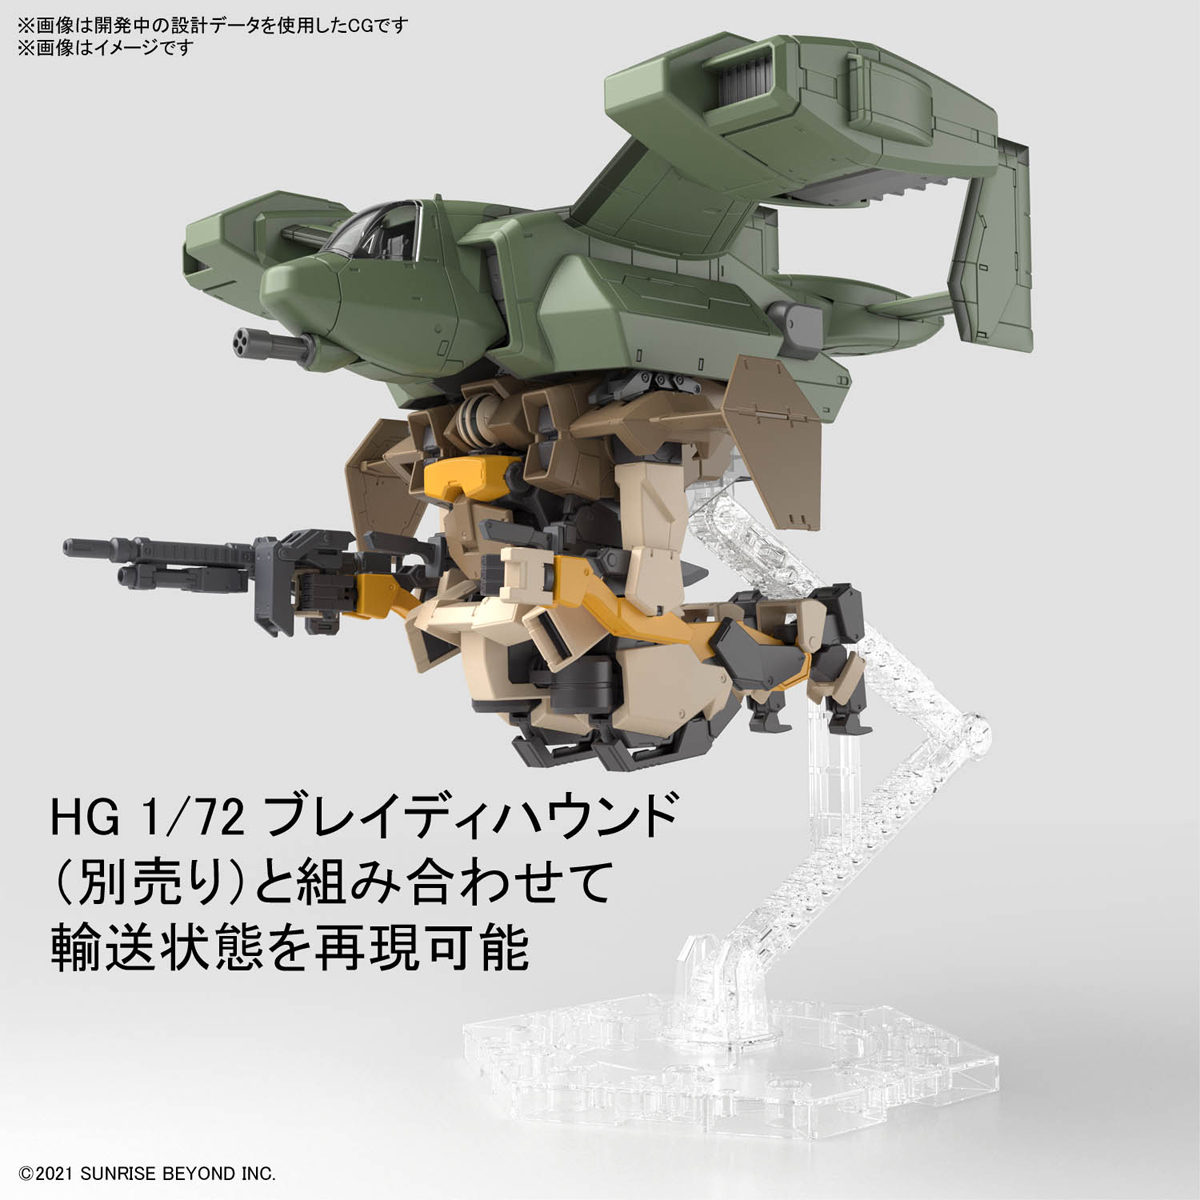 HG 1/72『ブレイディハウンド』境界戦機 プラモデル-011